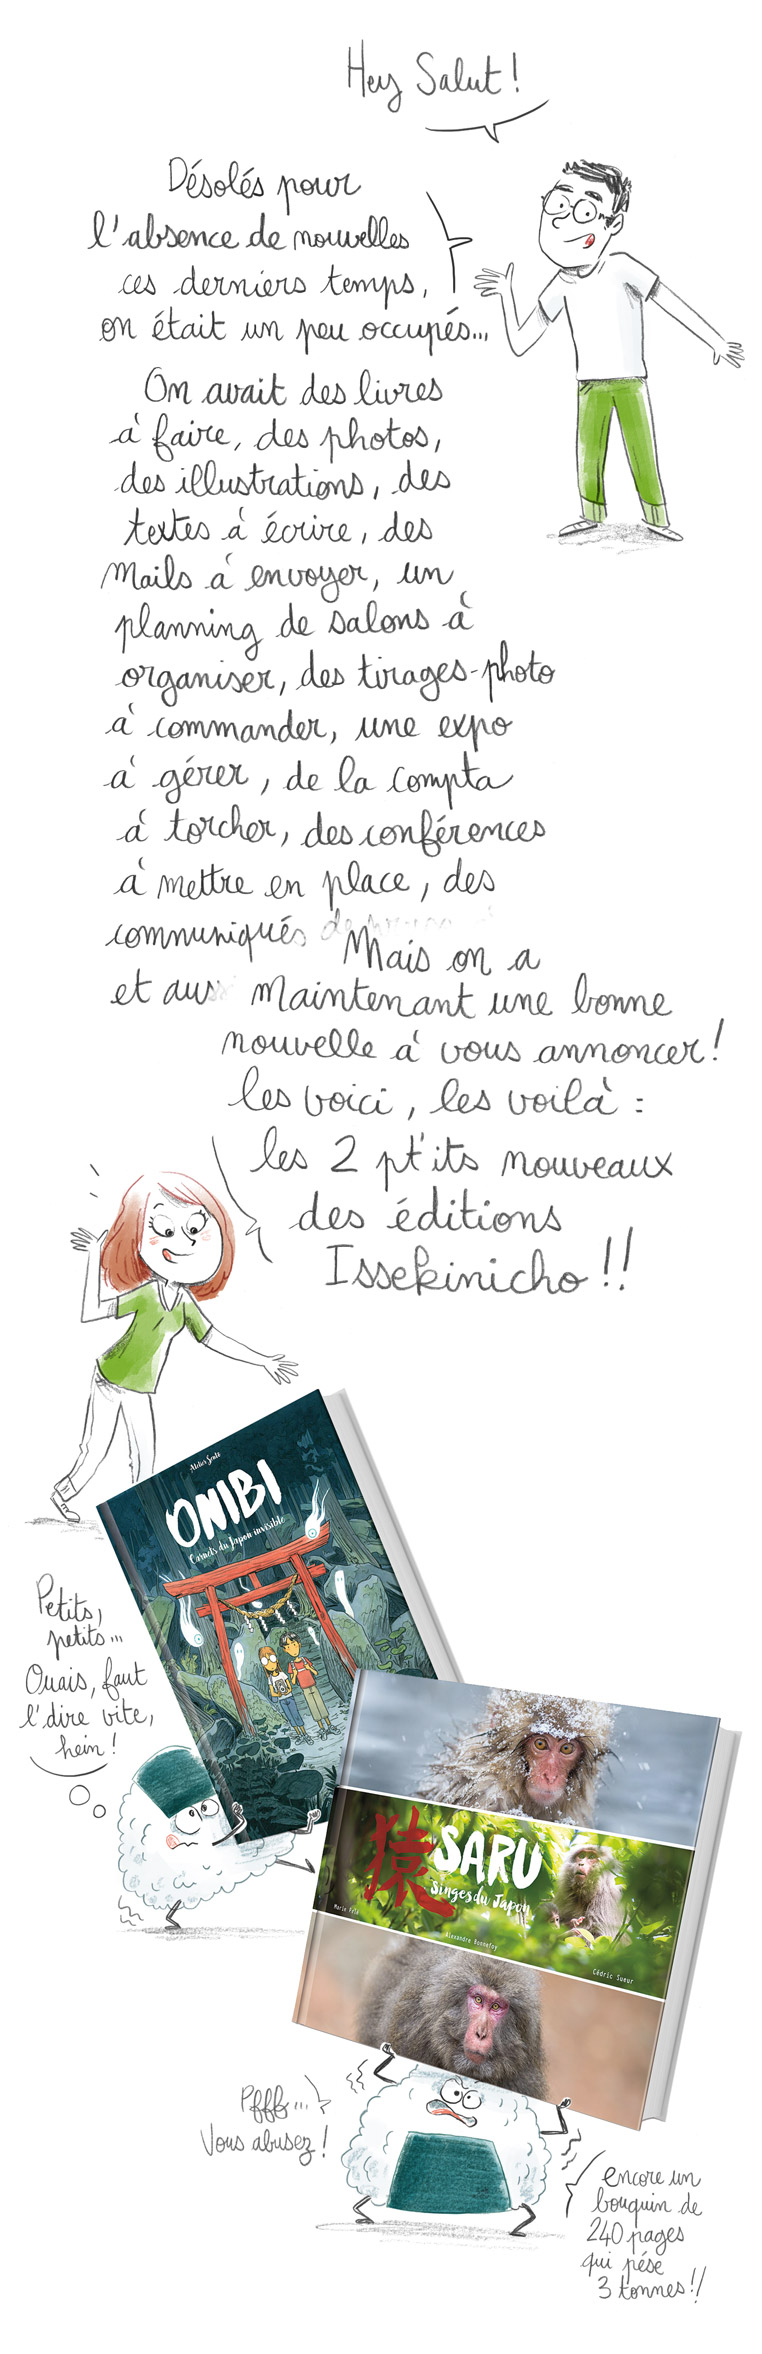 nouveautes_editions_issekinicho_rentree2016